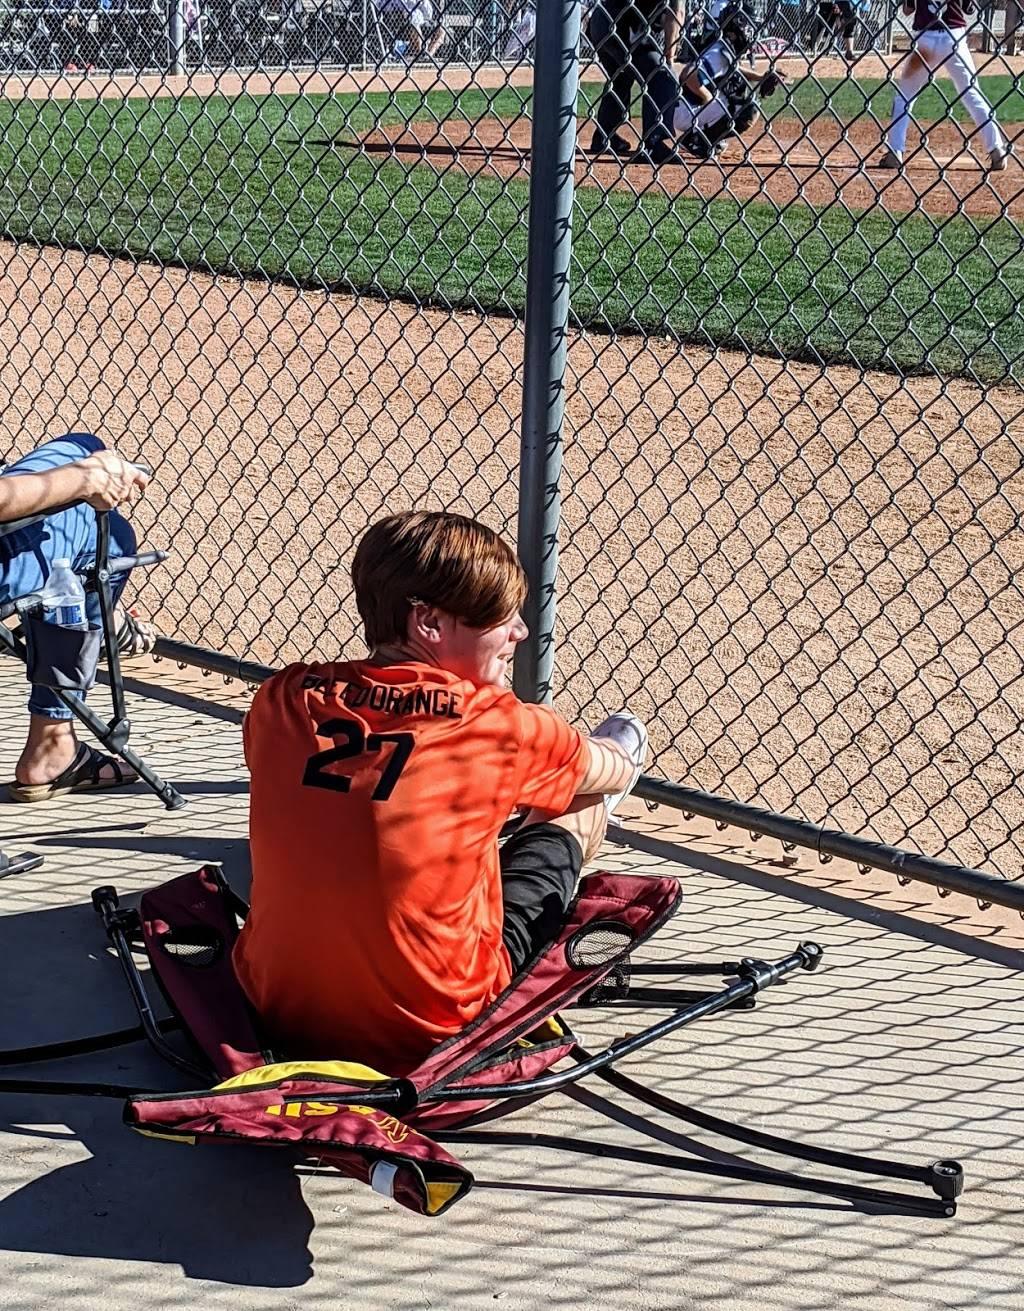 Red Mountain Baseball Complex - park  | Photo 6 of 8 | Address: 8008 E Brown Rd, Mesa, AZ 85207, USA | Phone: (480) 644-2352